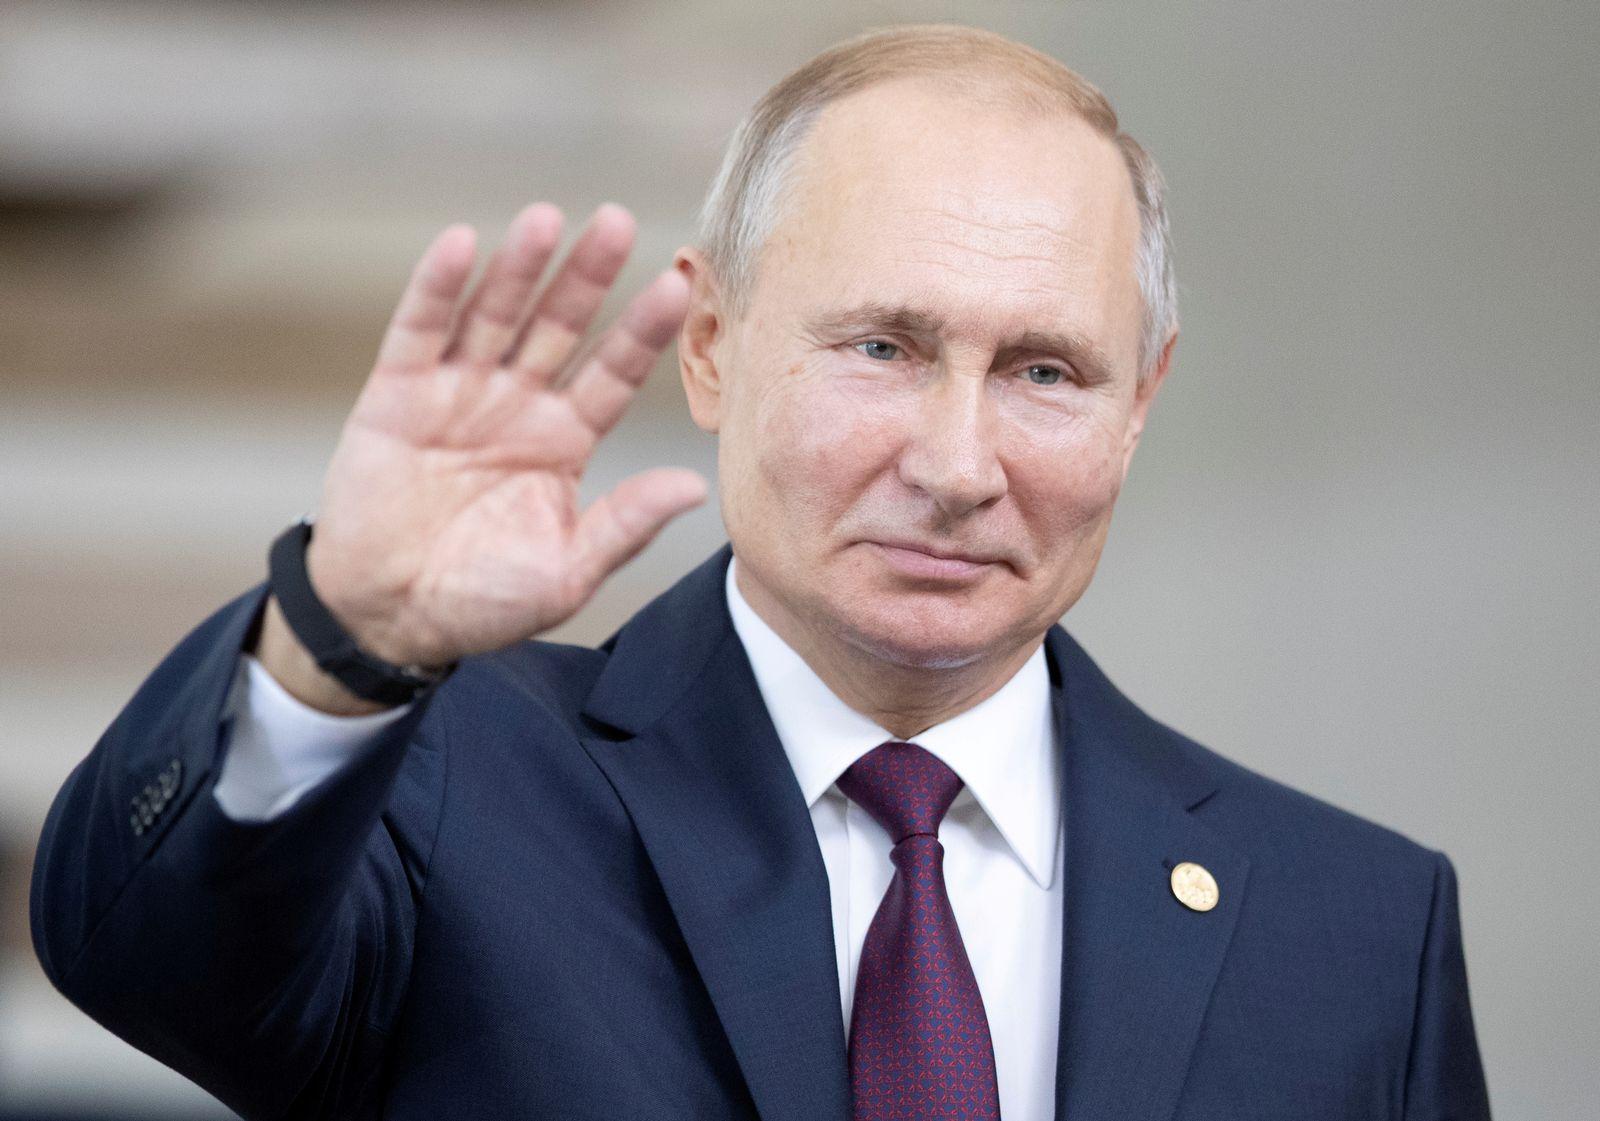 RUSSIA-POLITICS/MEDIA